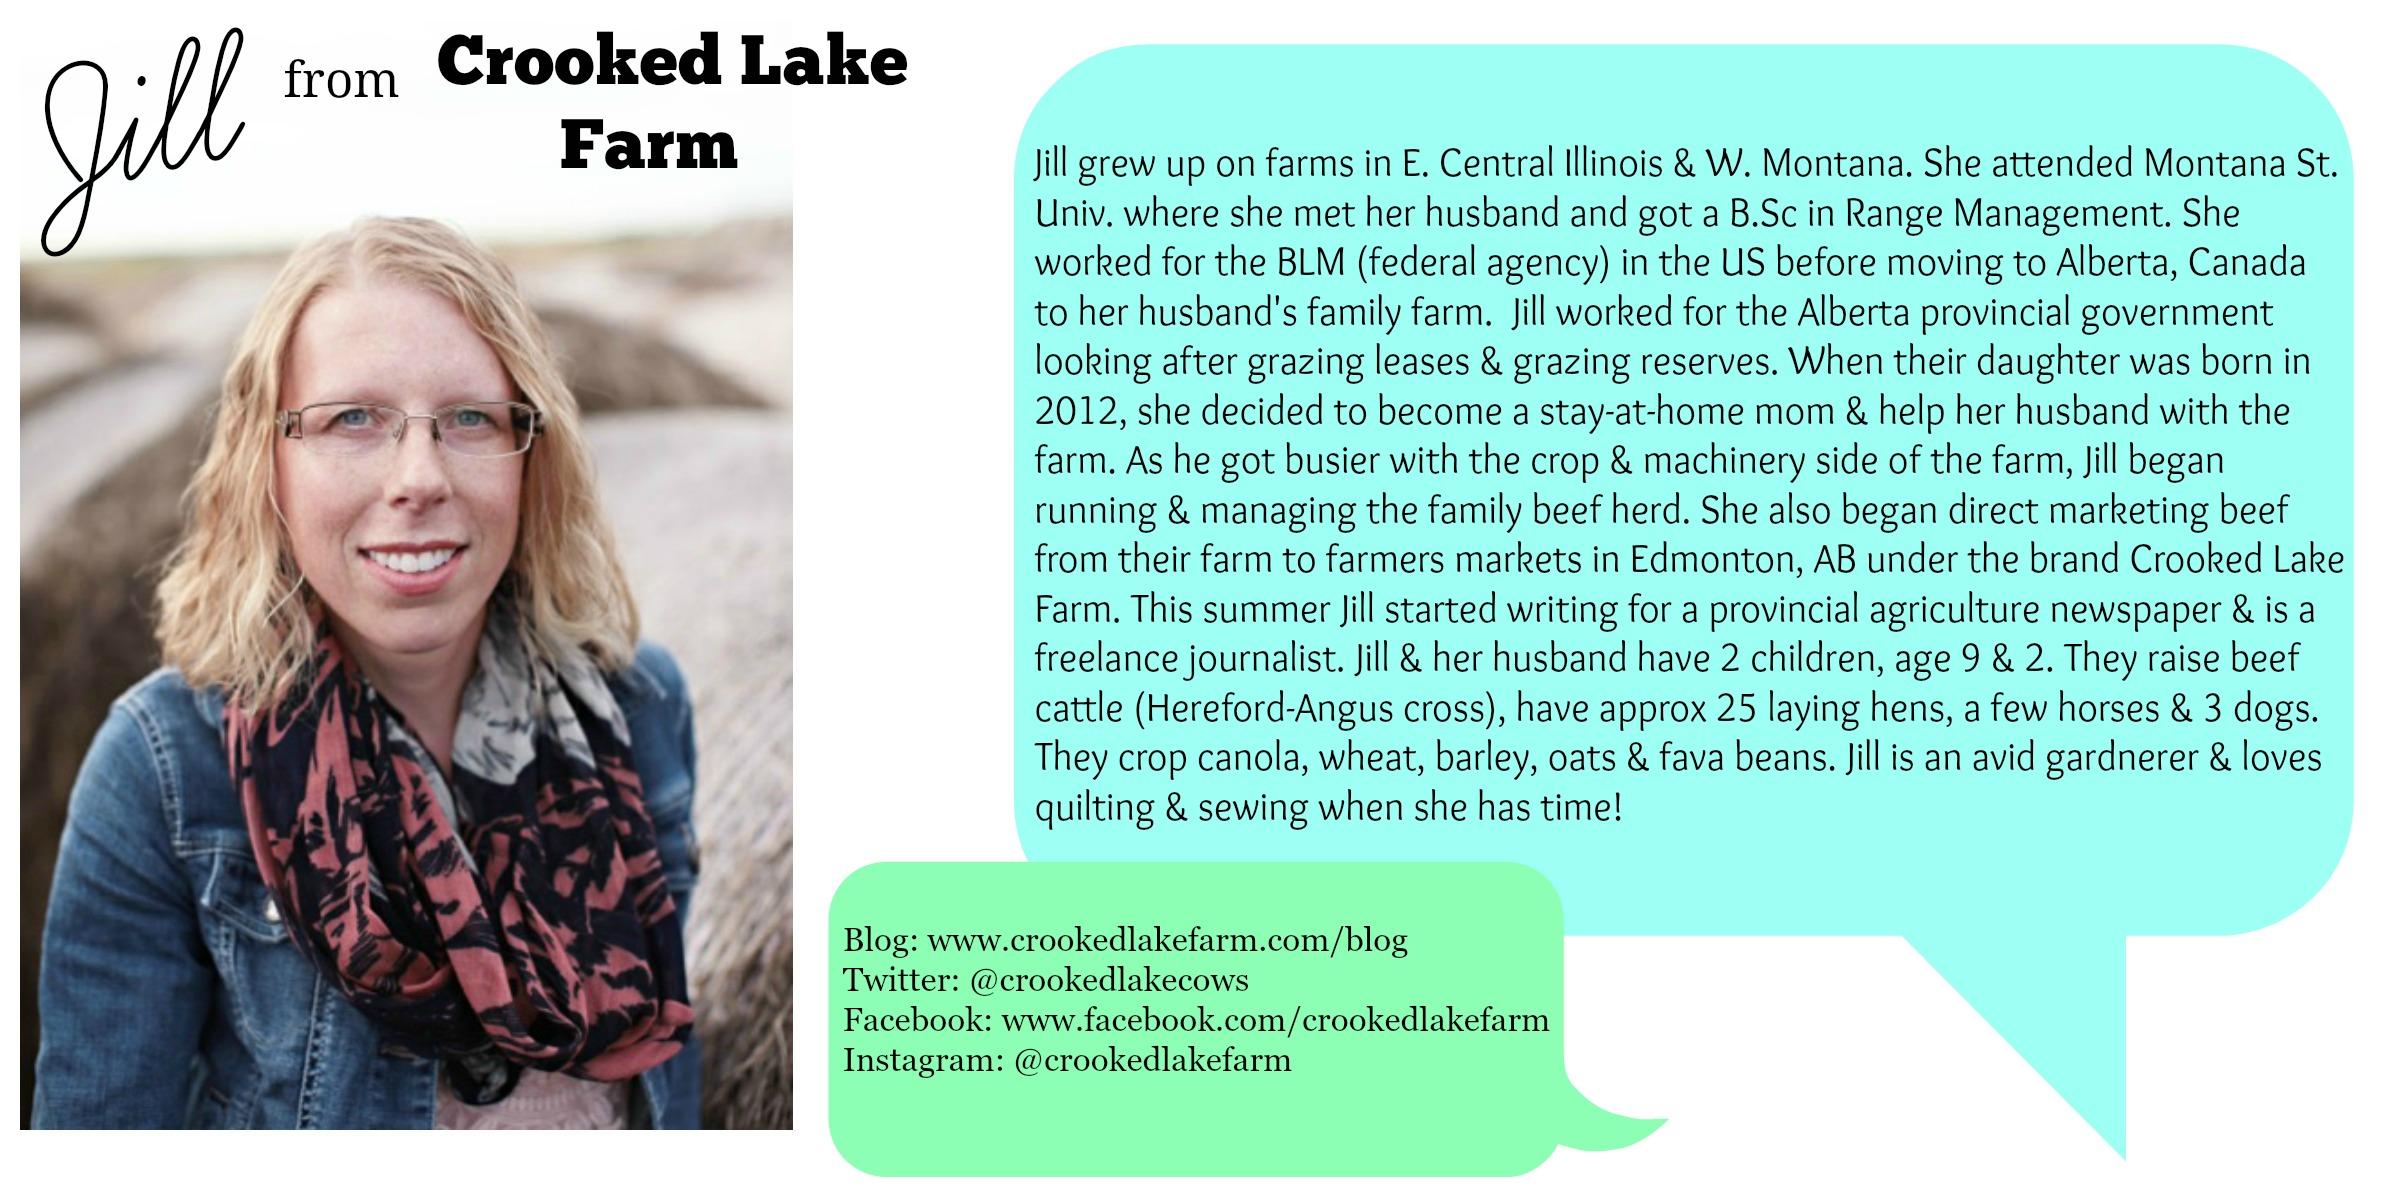 Jill Crooked Lake Farm